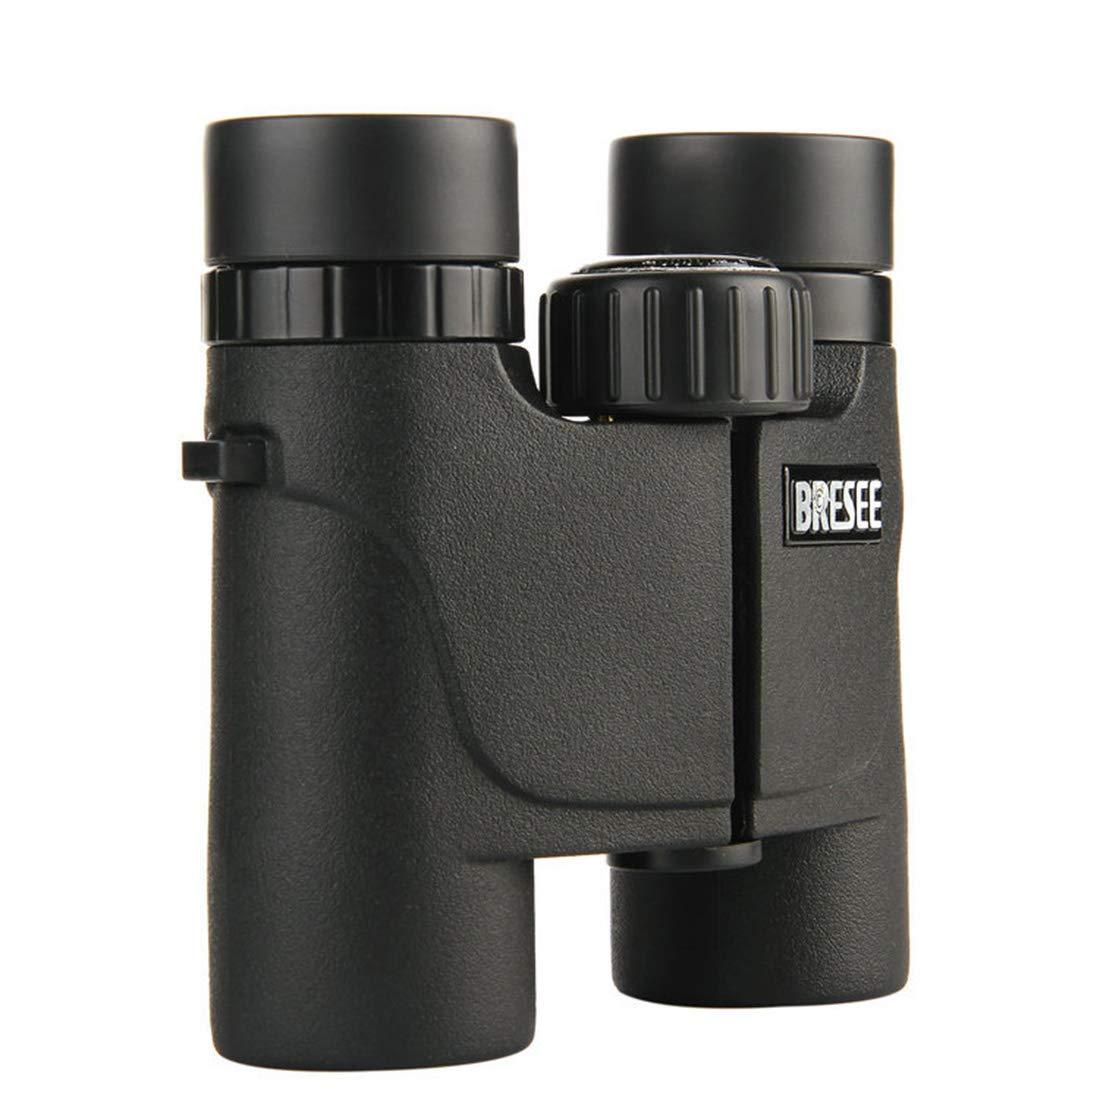 UICICI UICICI UICICI Binoculares 10x26 Visión Nocturna de Baja iluminación con Alta definición Telescopio portátil Uso en Exteriores (Color   Negro) 986293